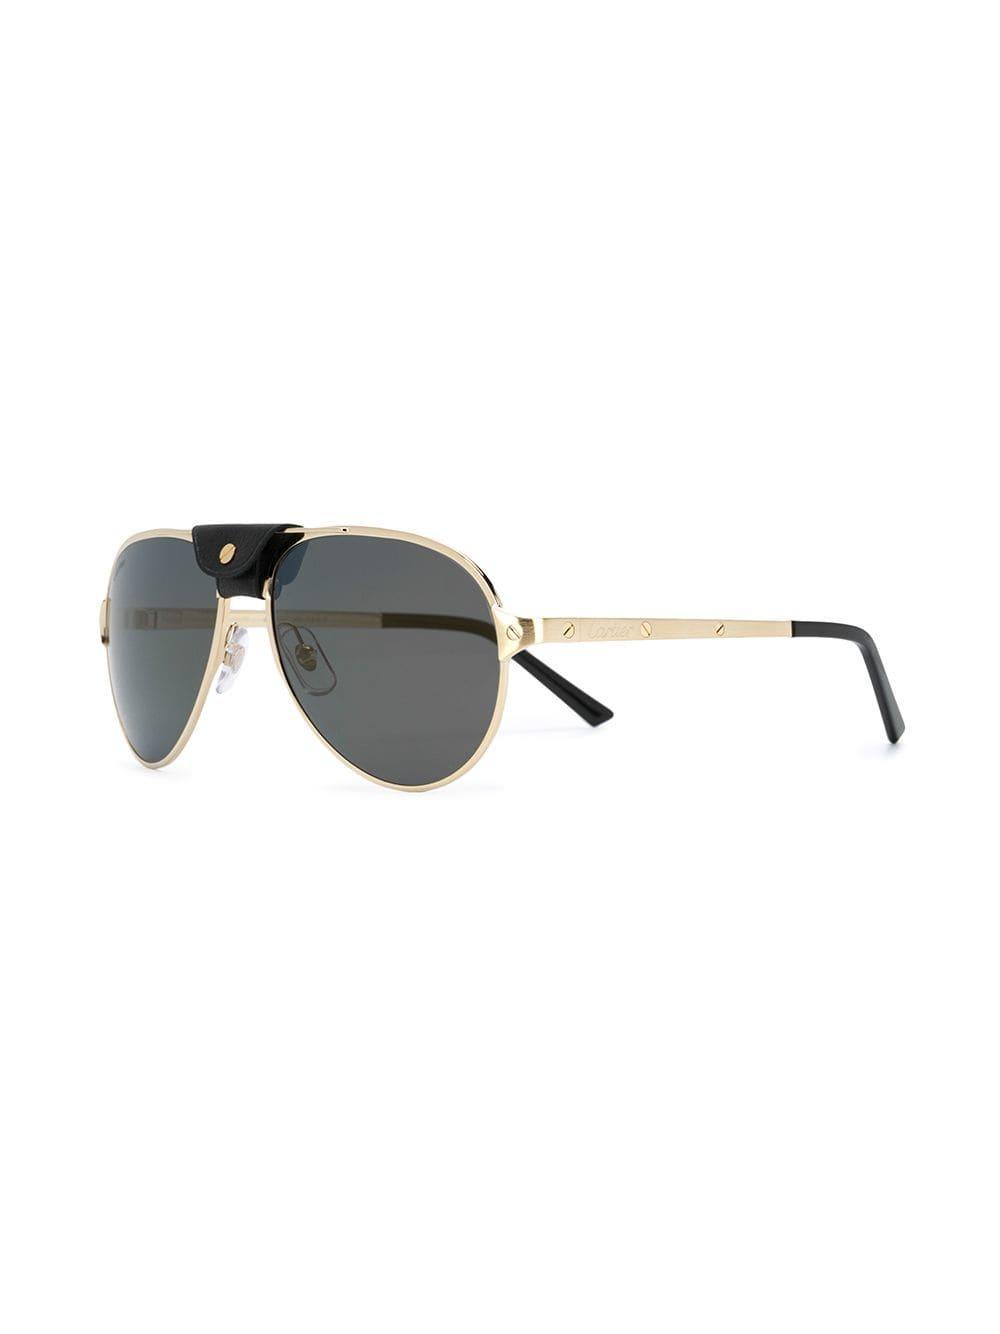 fbdc29ab94d4 Cartier - Metallic Aviator Sunglasses - Lyst. View fullscreen